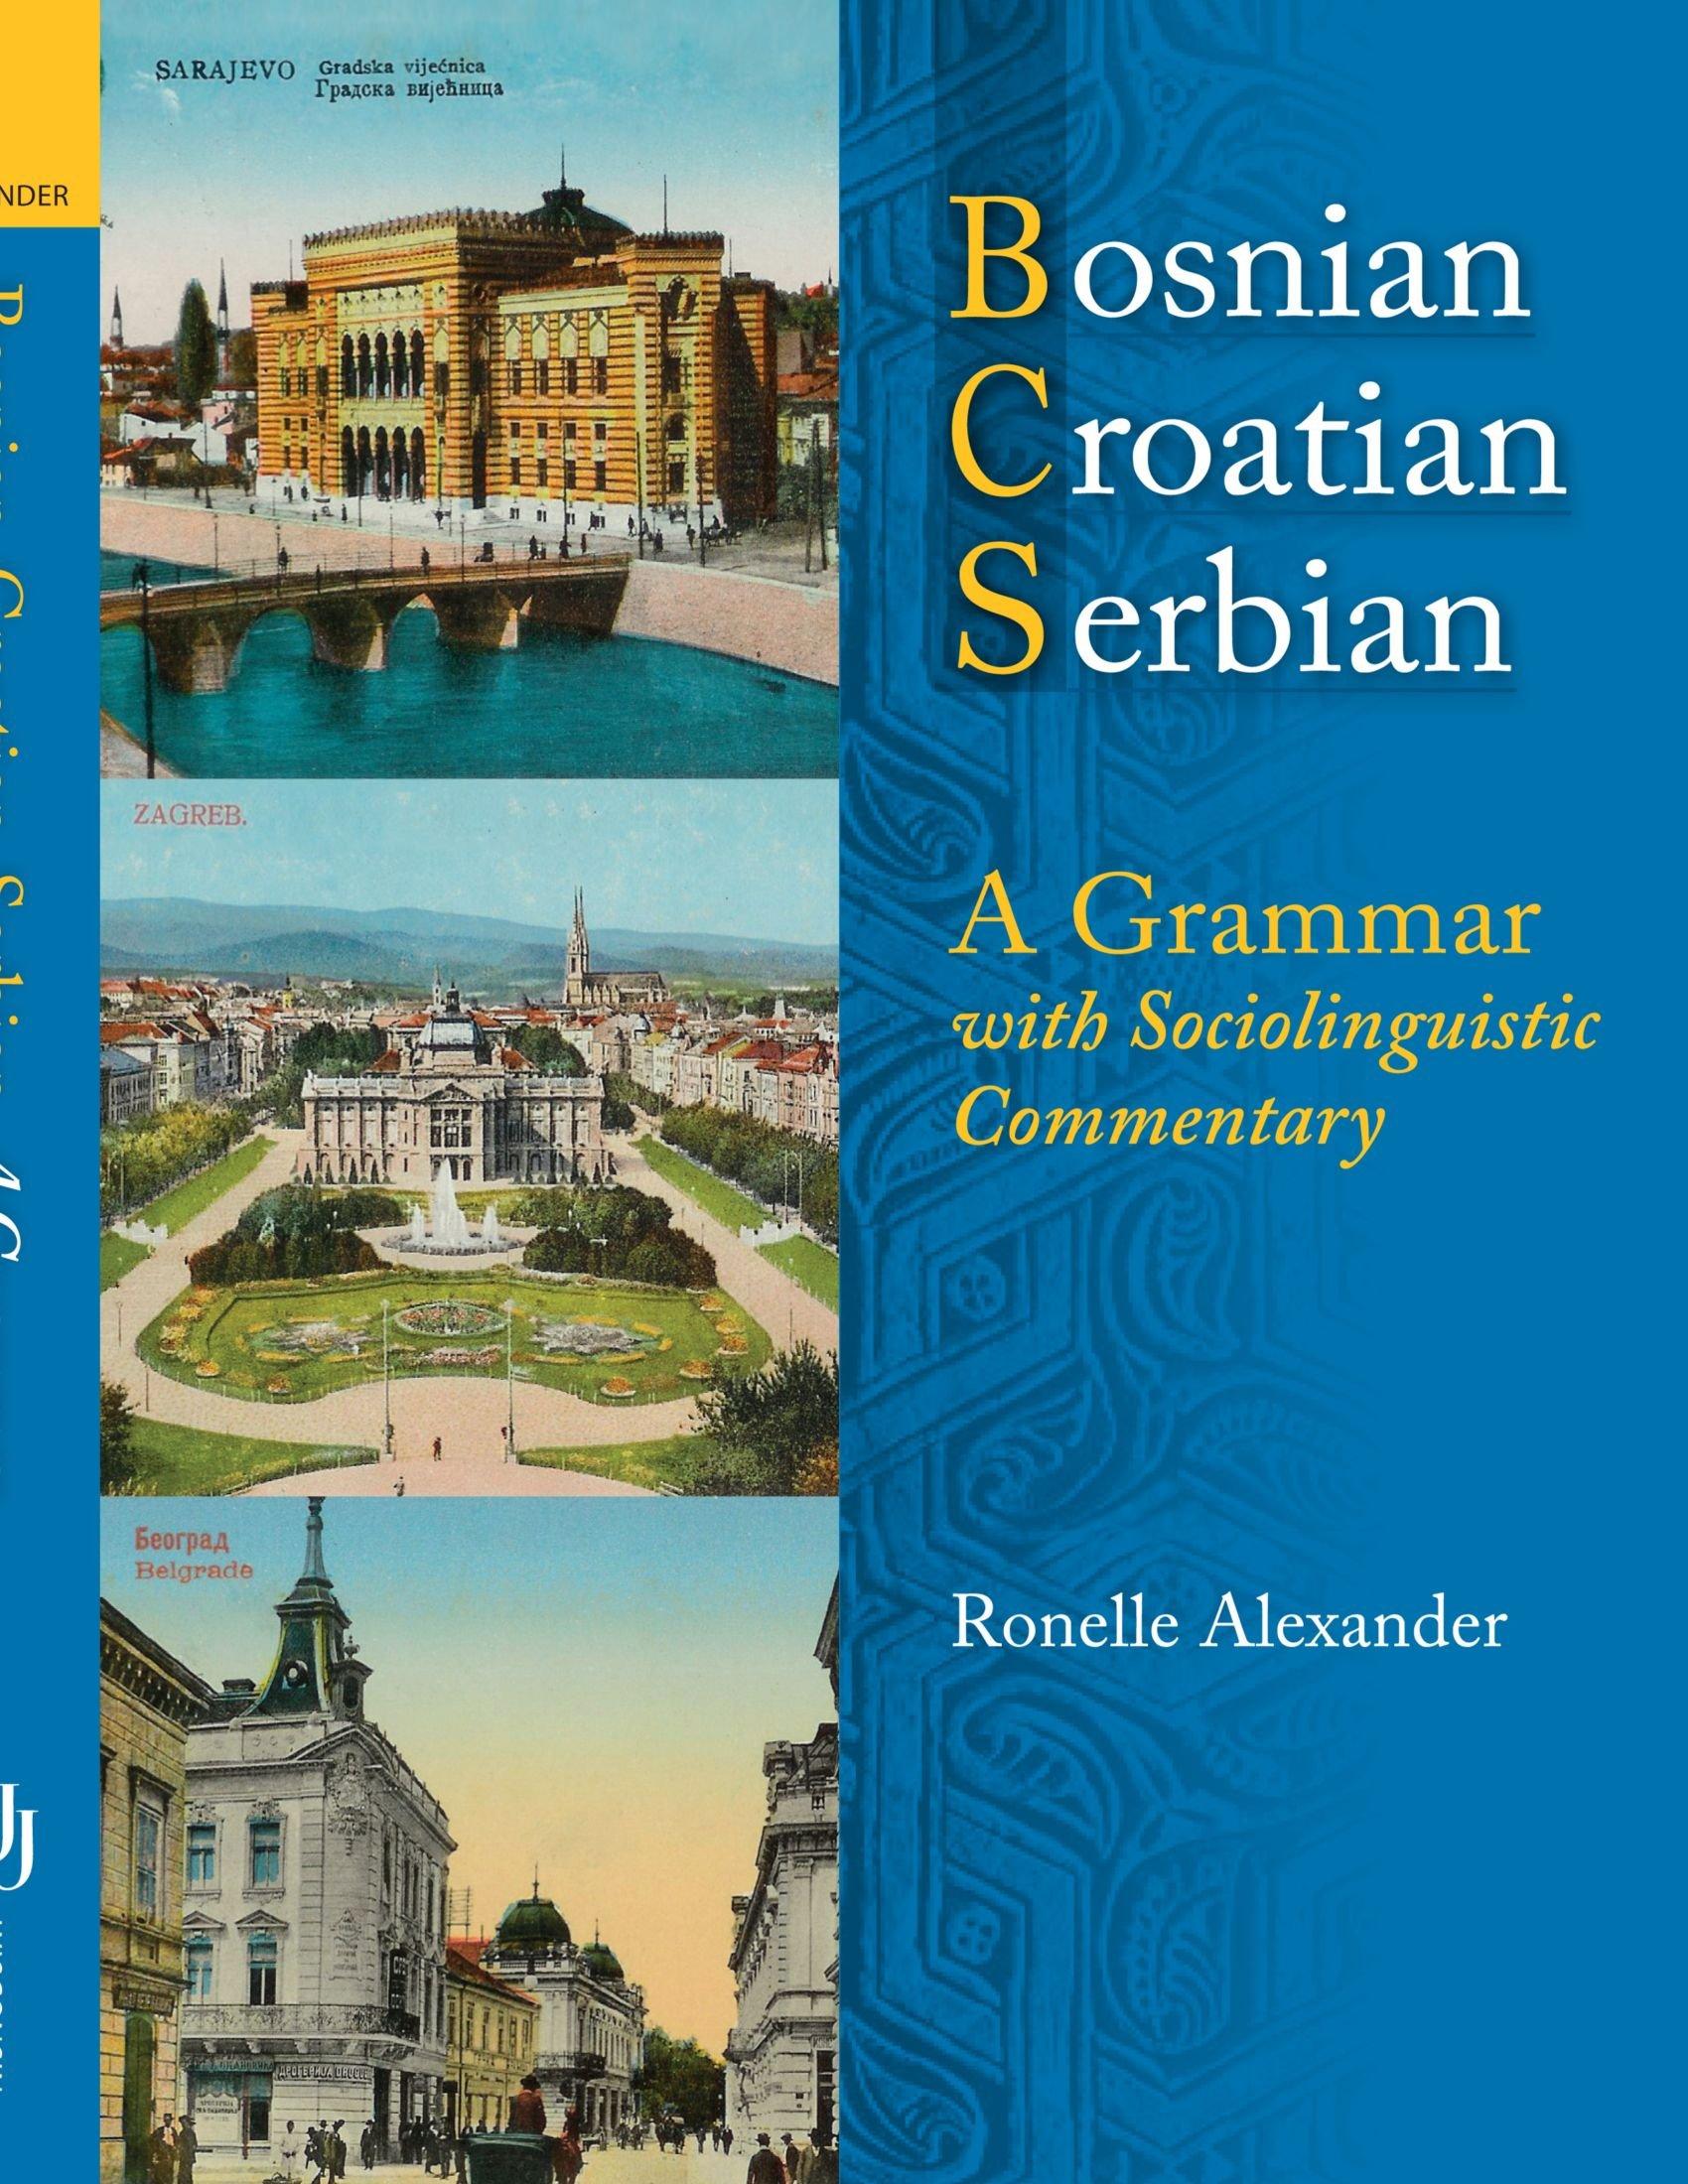 Complete Language Training Course Disc Learn to Speak SERBO-CROATIAN SERBIAN